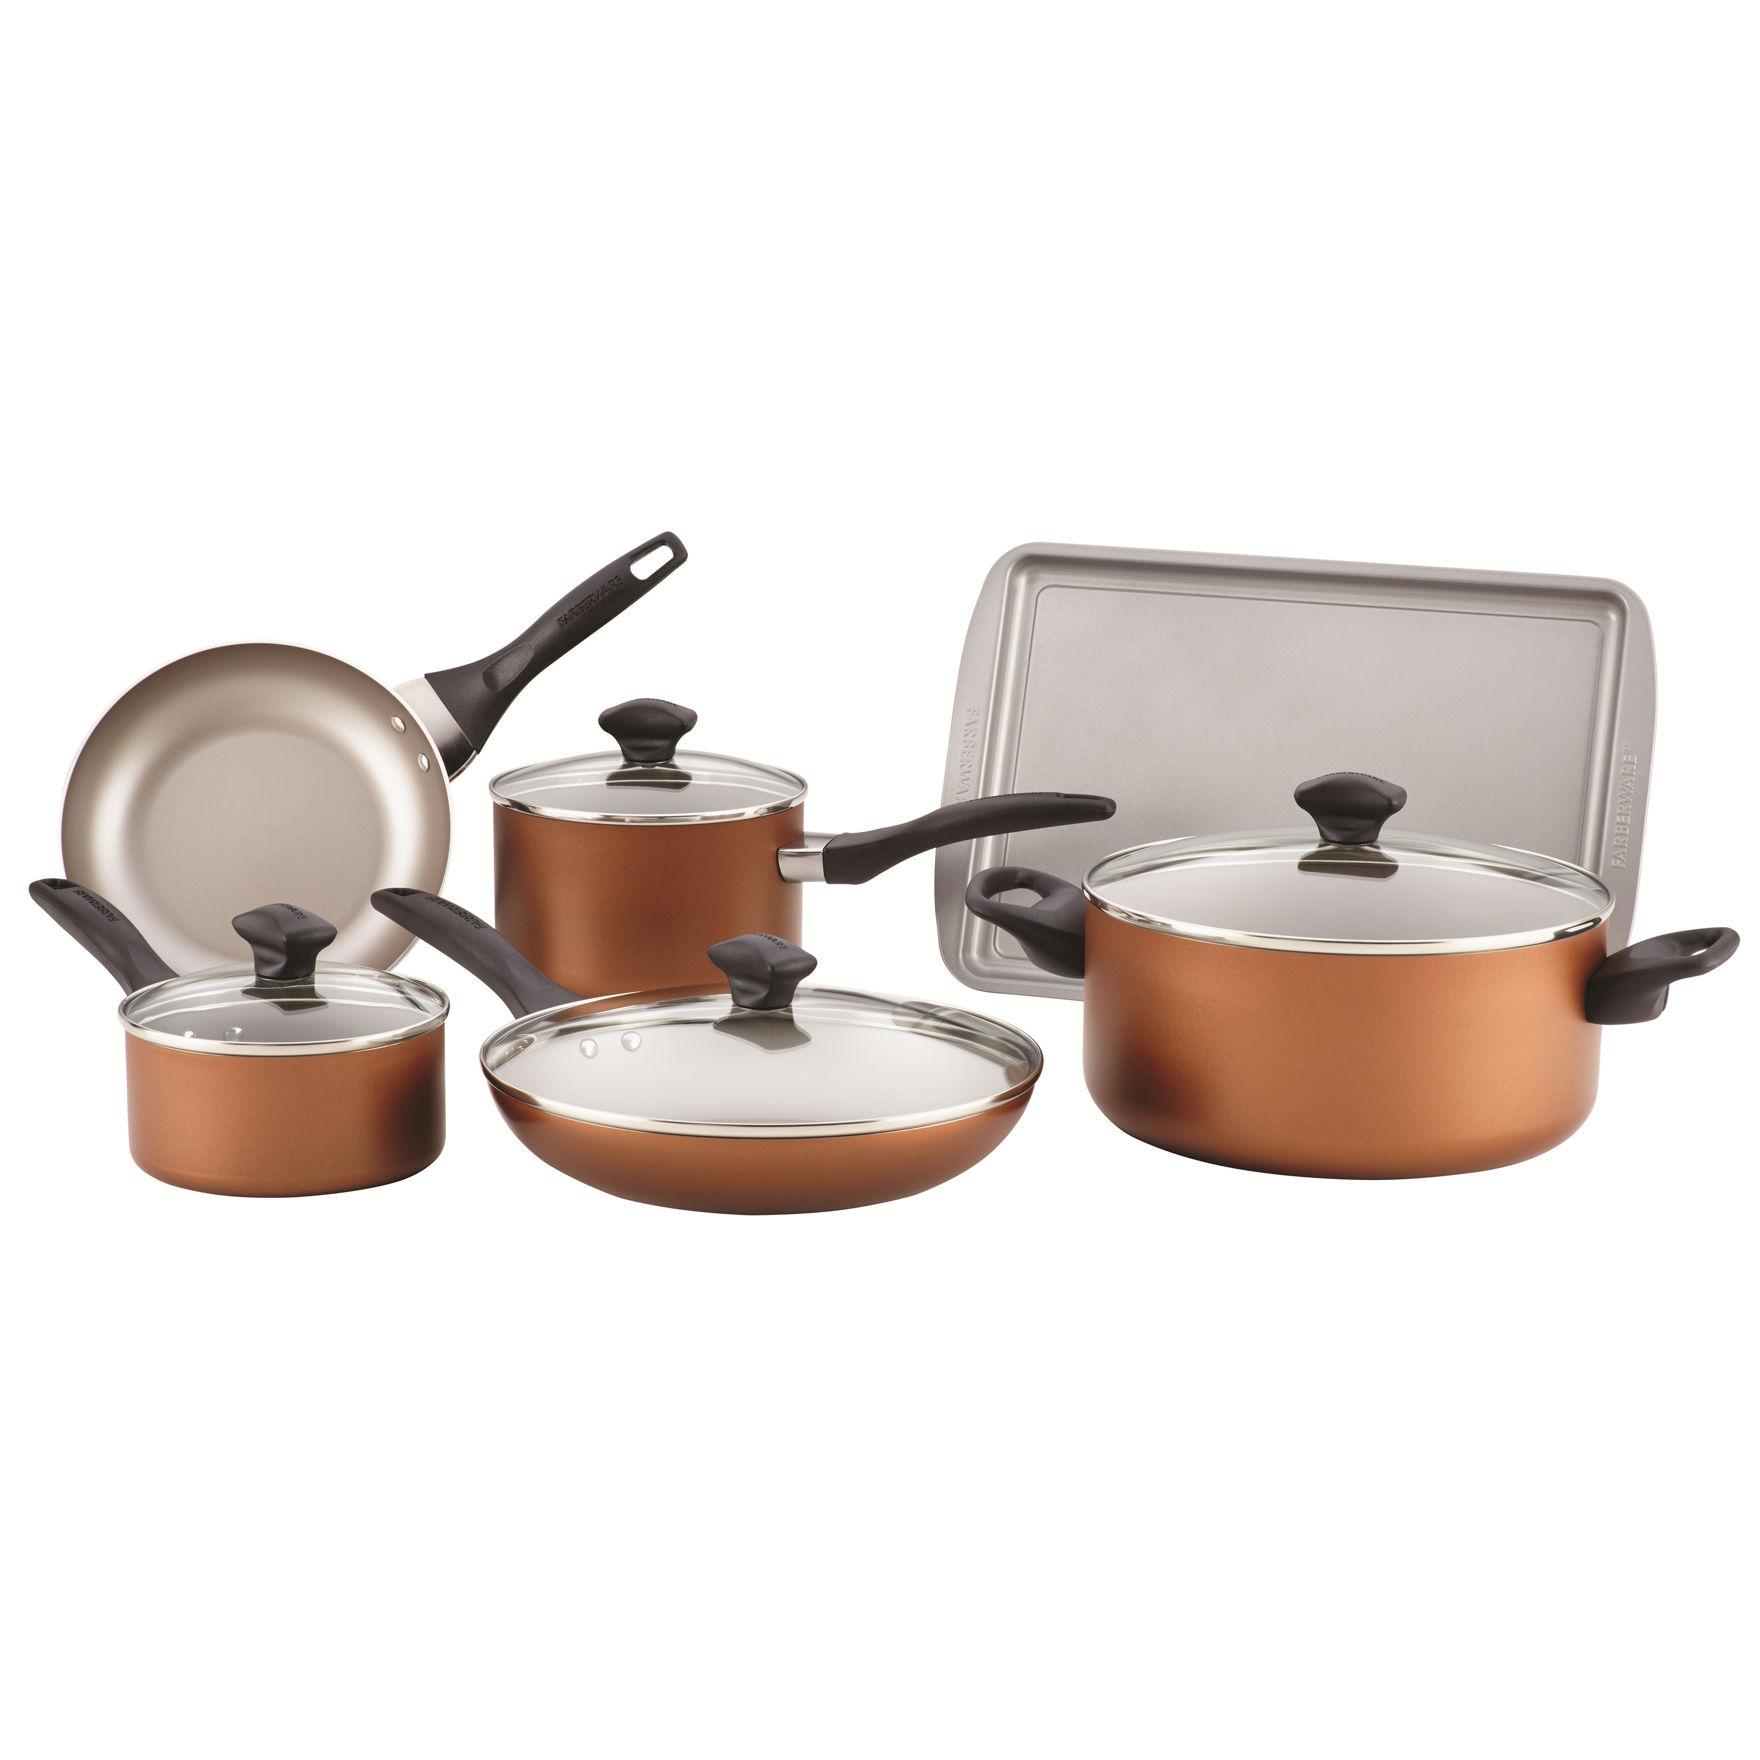 Farberware Copper Cookware Sets Cookware